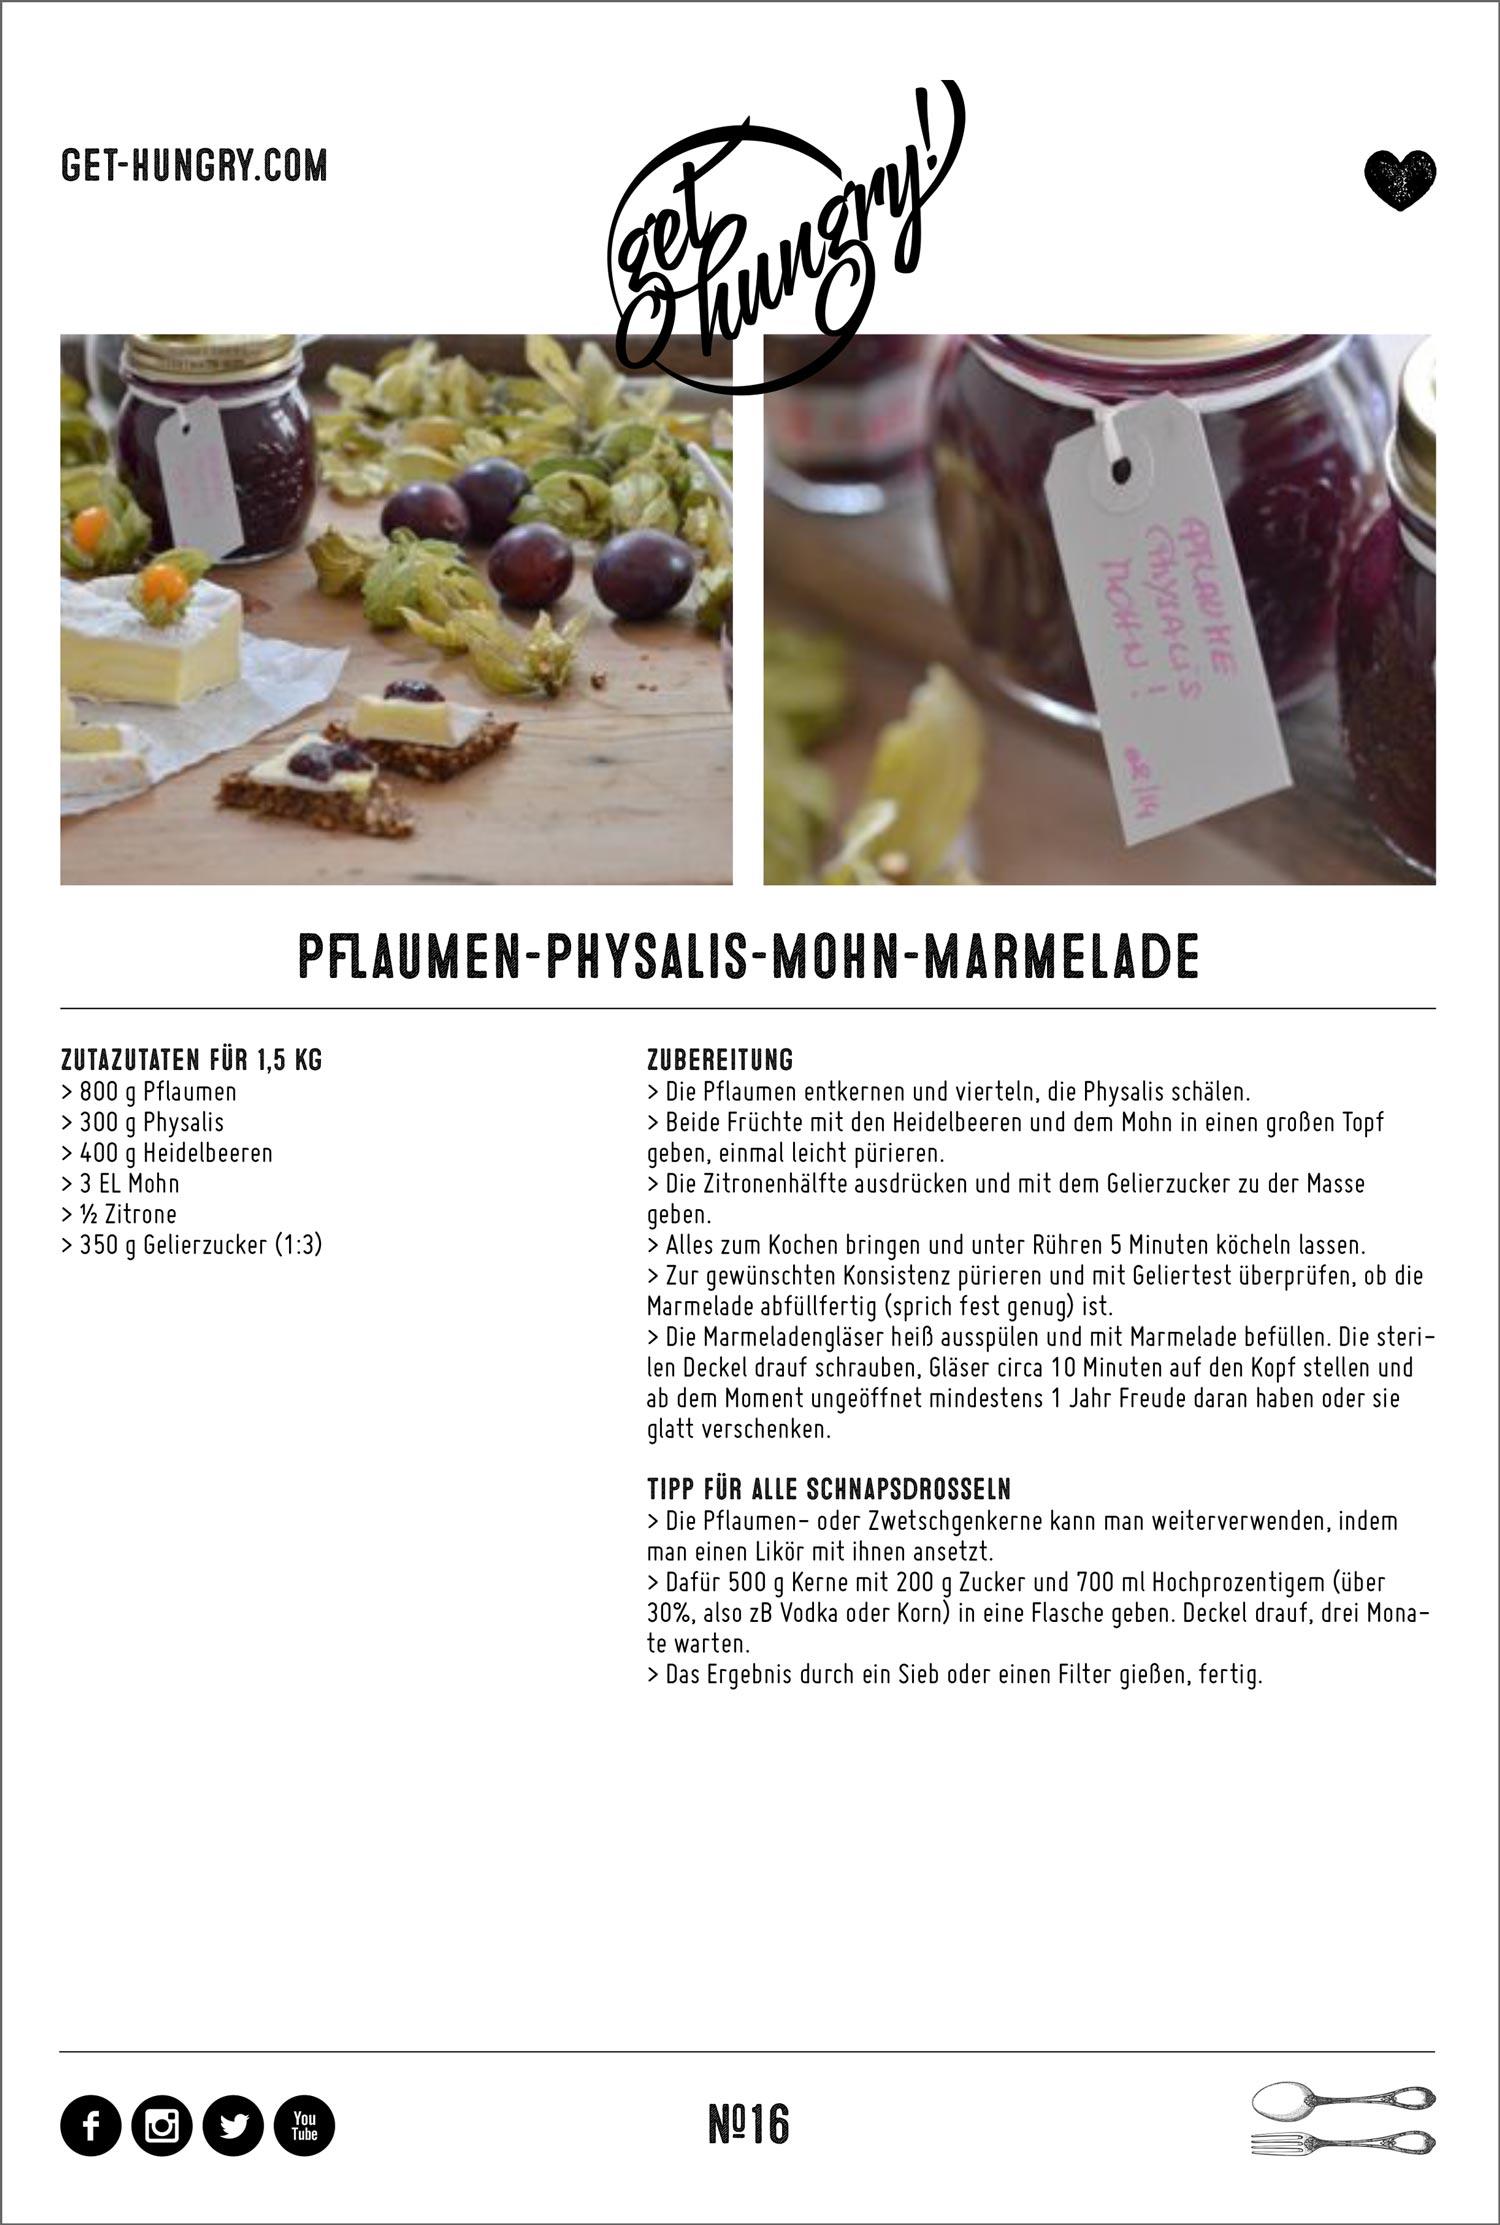 pflaumenphysalis_Marmelade_gethungry